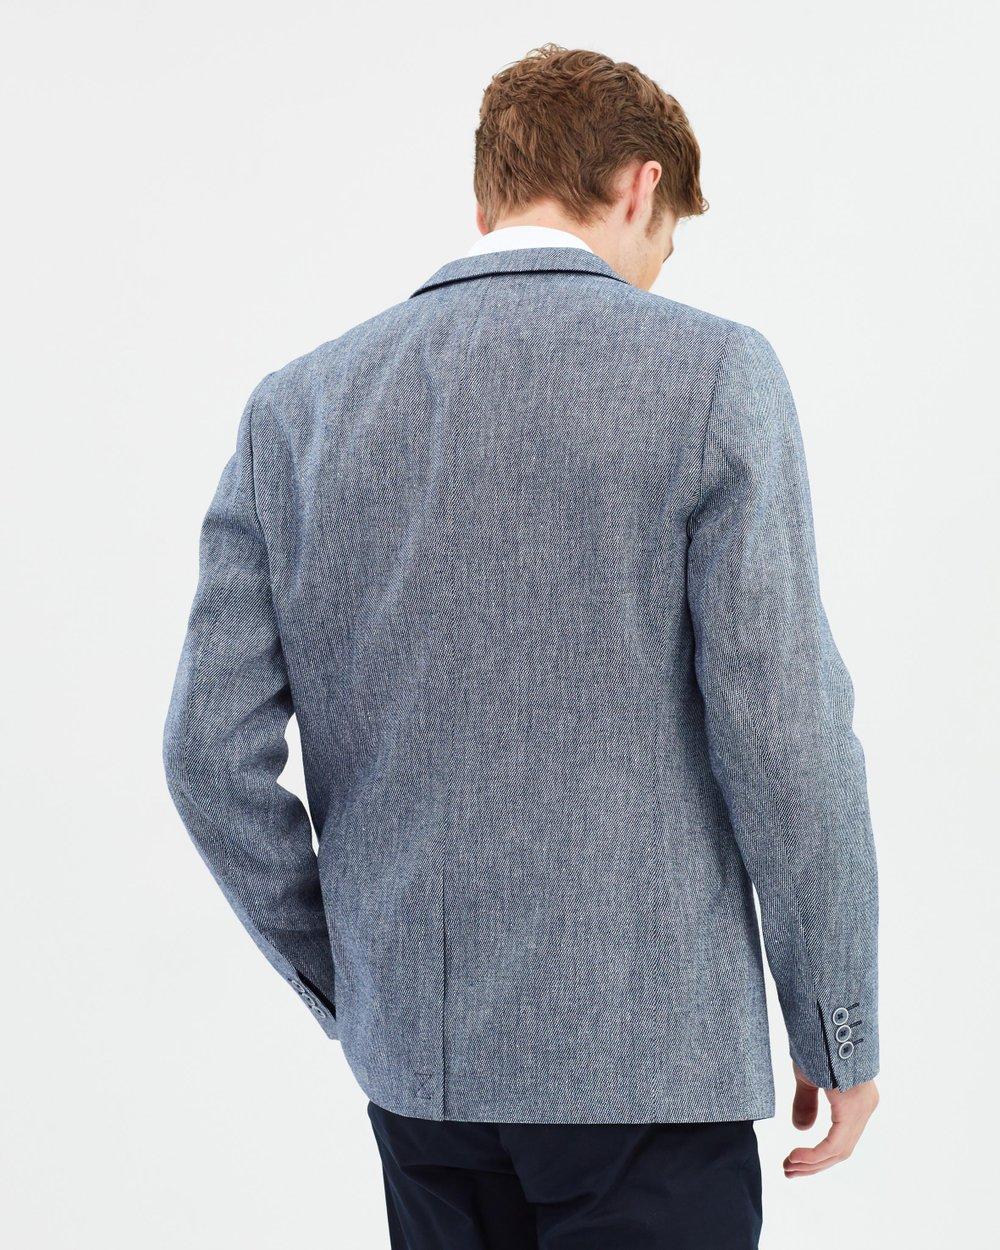 55c5e489c Hines Slim Fit Linen Blend Blazer by Ted Baker Online